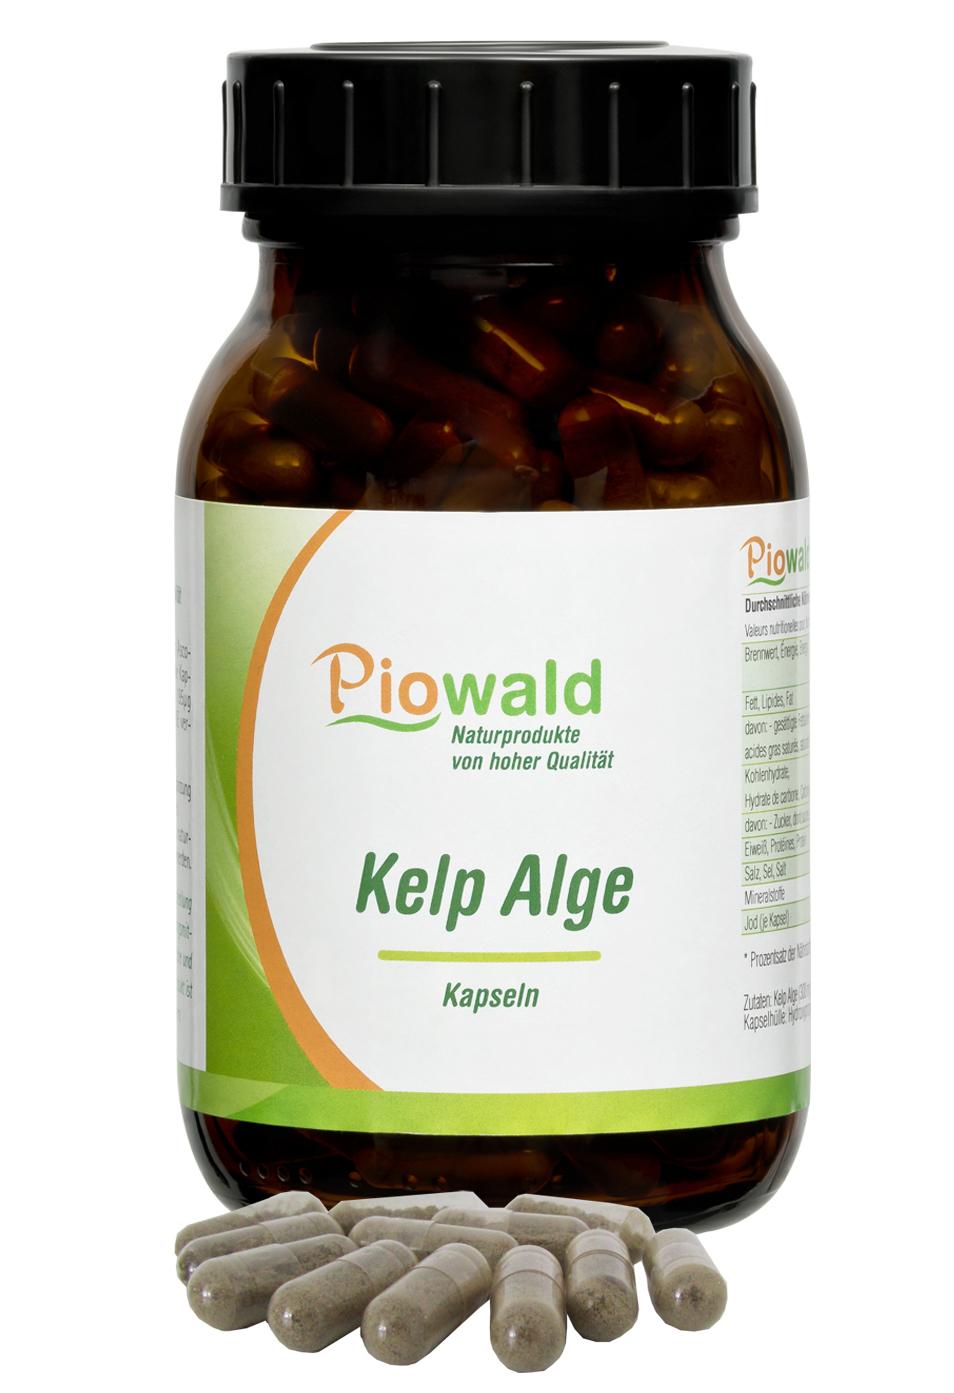 kelp alge 220 vegi kapseln im braunglas piowald gmbh. Black Bedroom Furniture Sets. Home Design Ideas